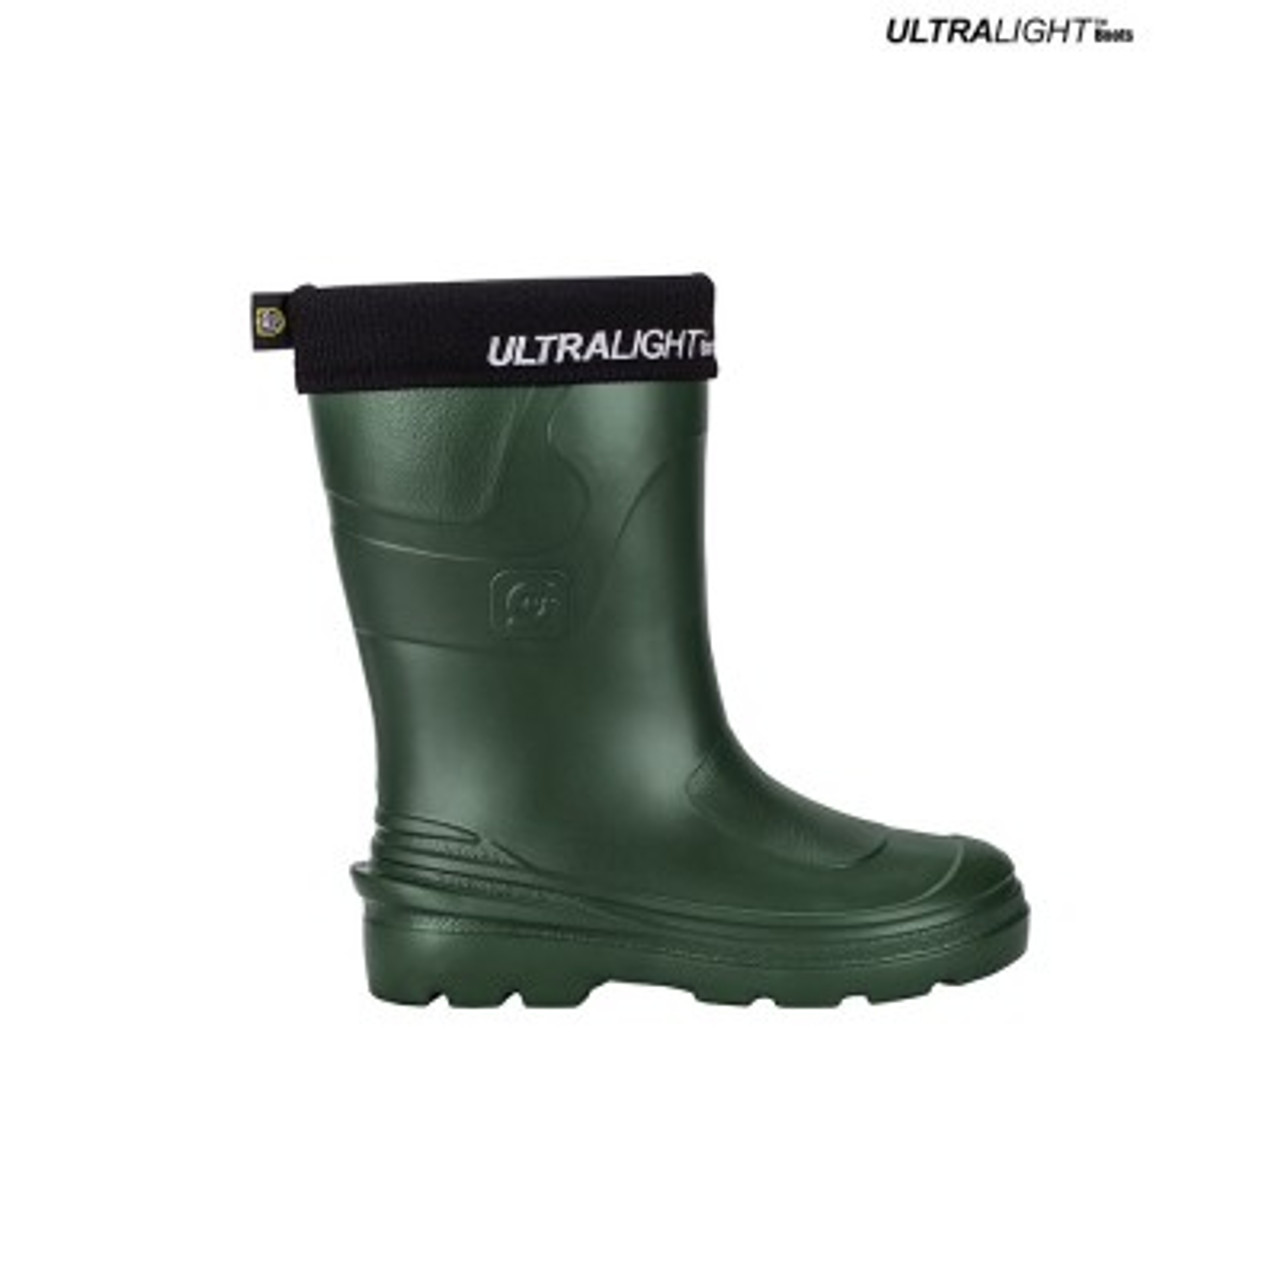 Ultralight Ladies Rubber Rain Boots